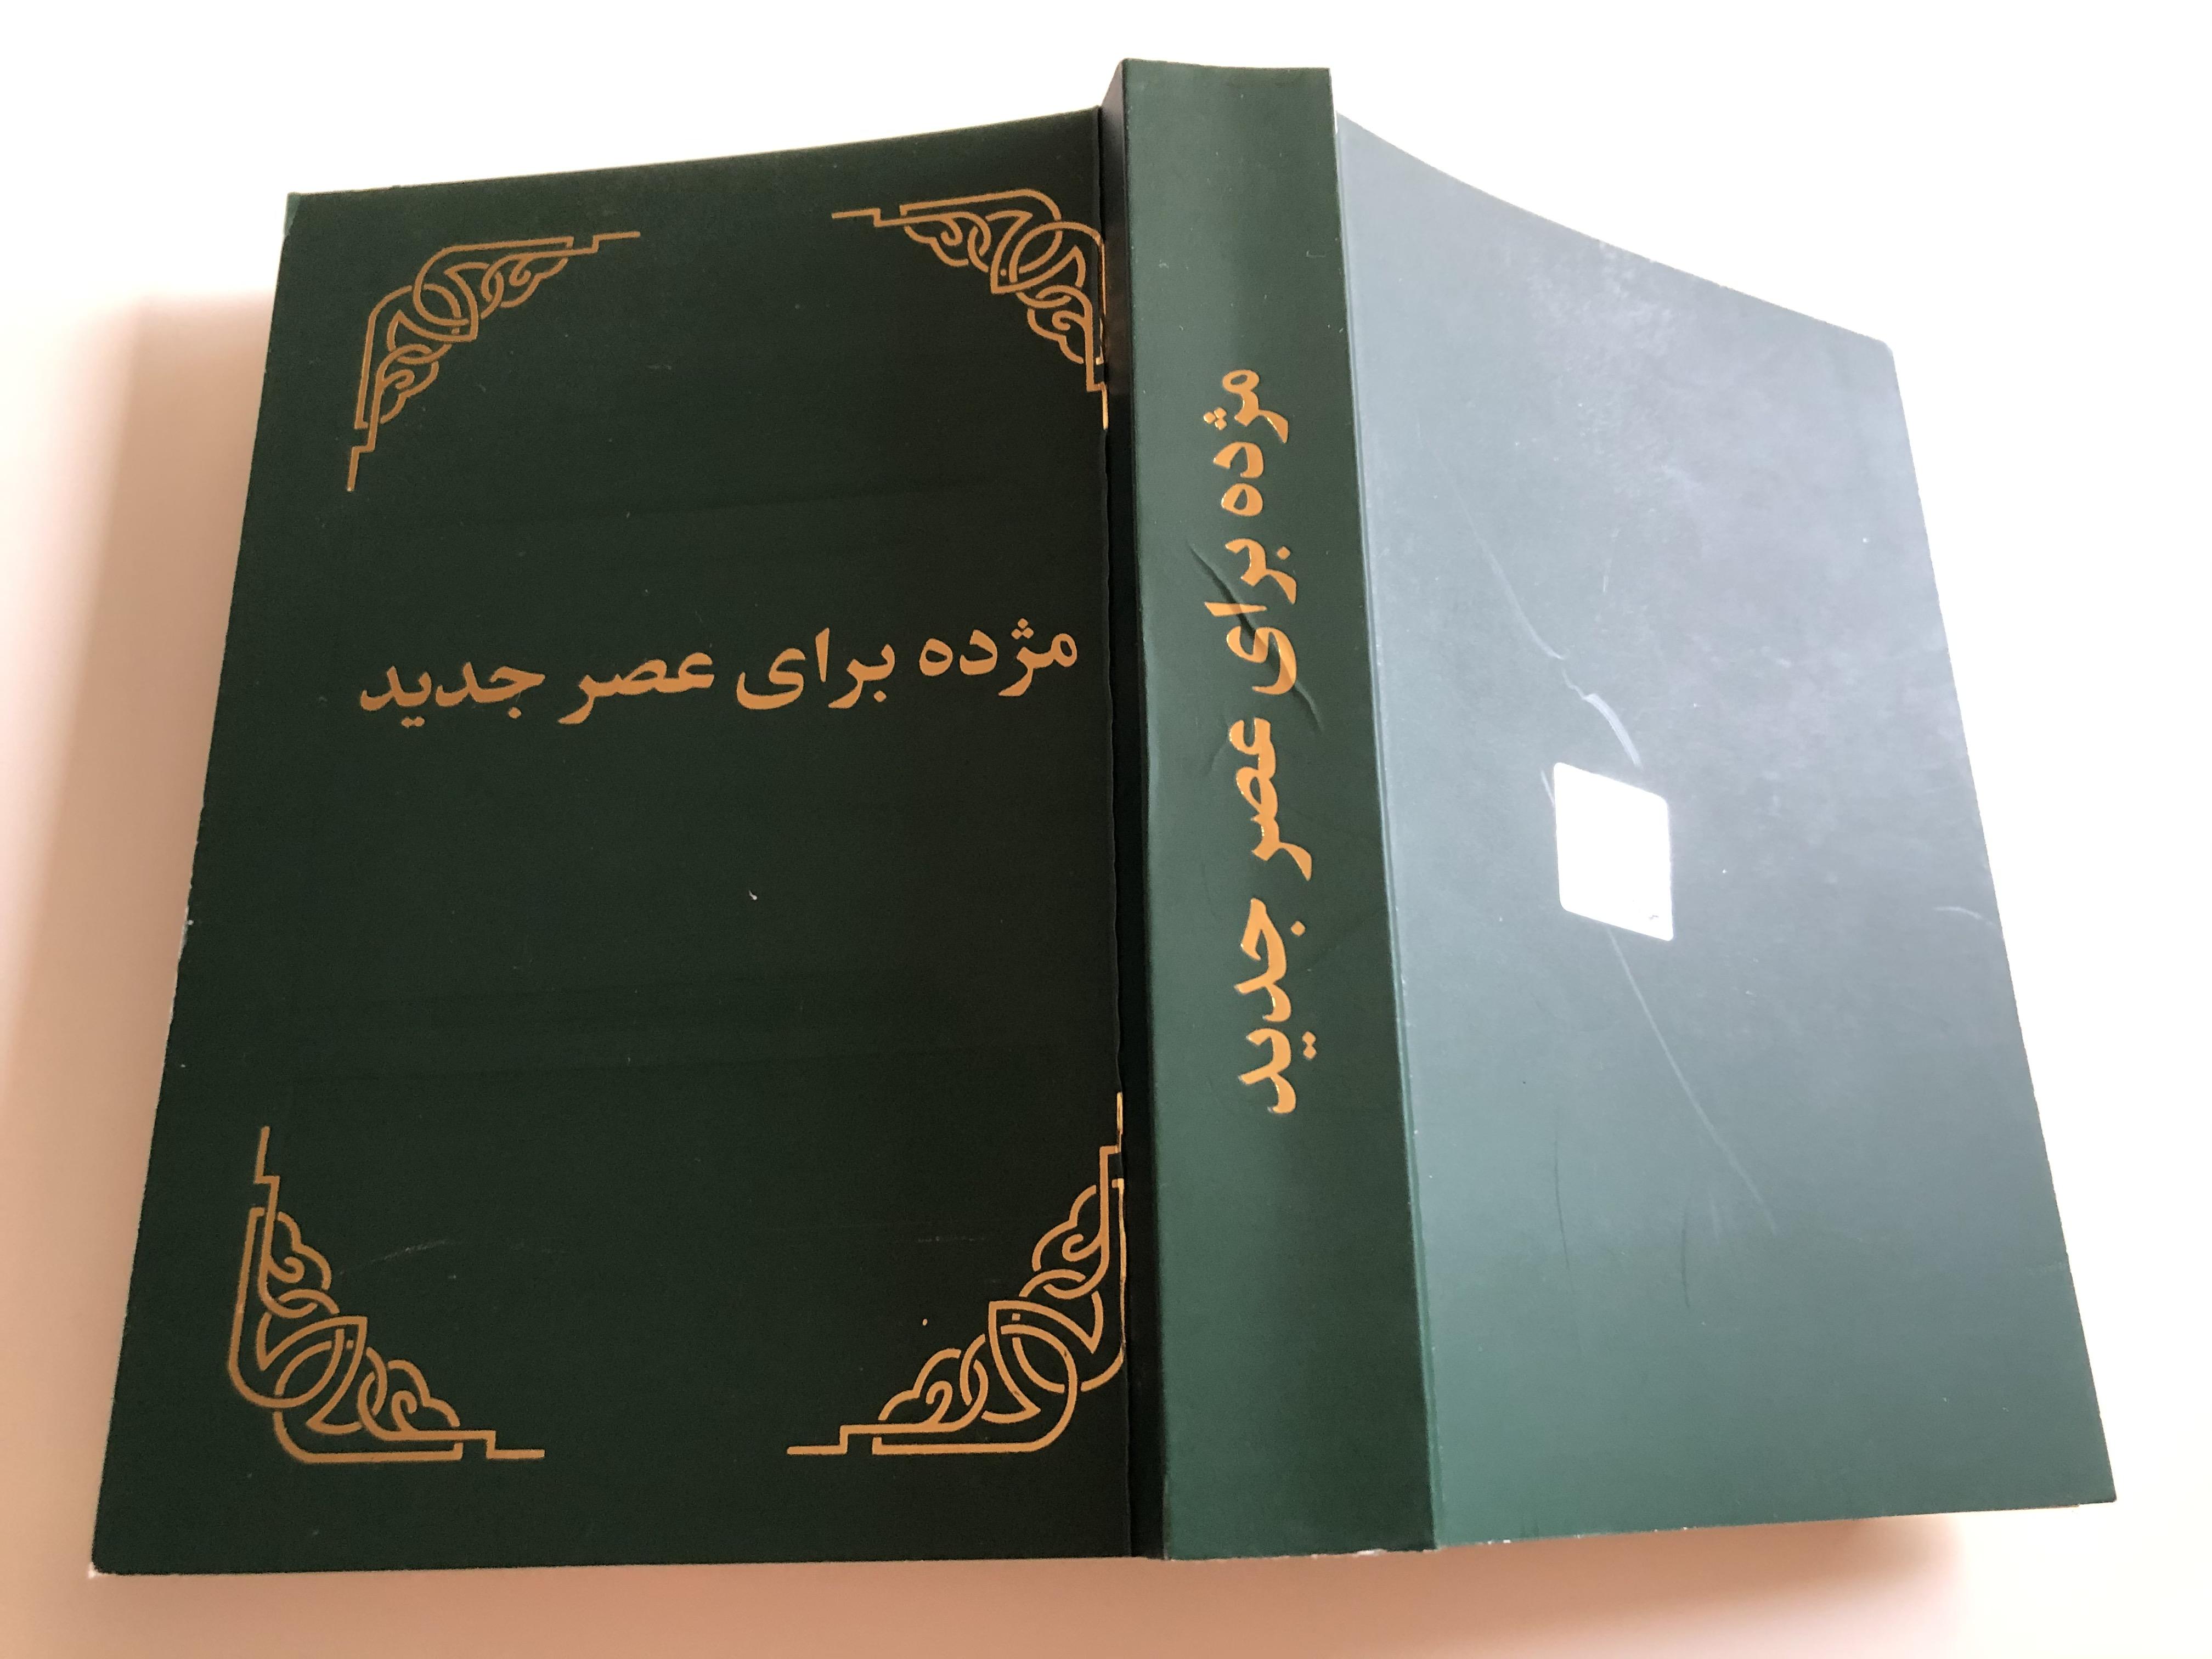 dari-new-testament-first-edition-kitabi-mukaddes-sirketi-ubs-2019-13-.jpg